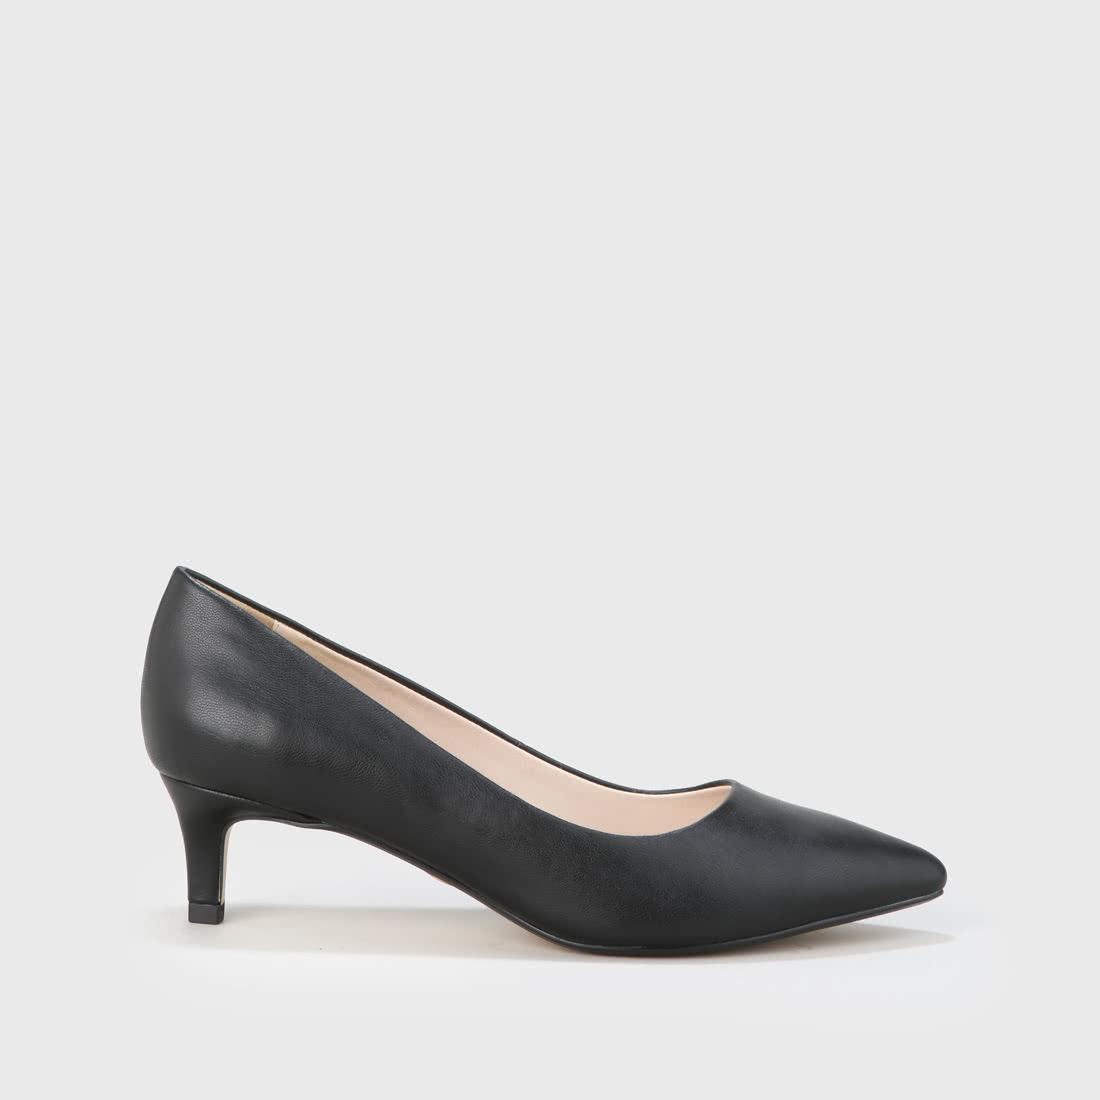 367e7787a37 Arielle Escarpin aspect cuir verni noir acheter à BUFFALO en ligne ...